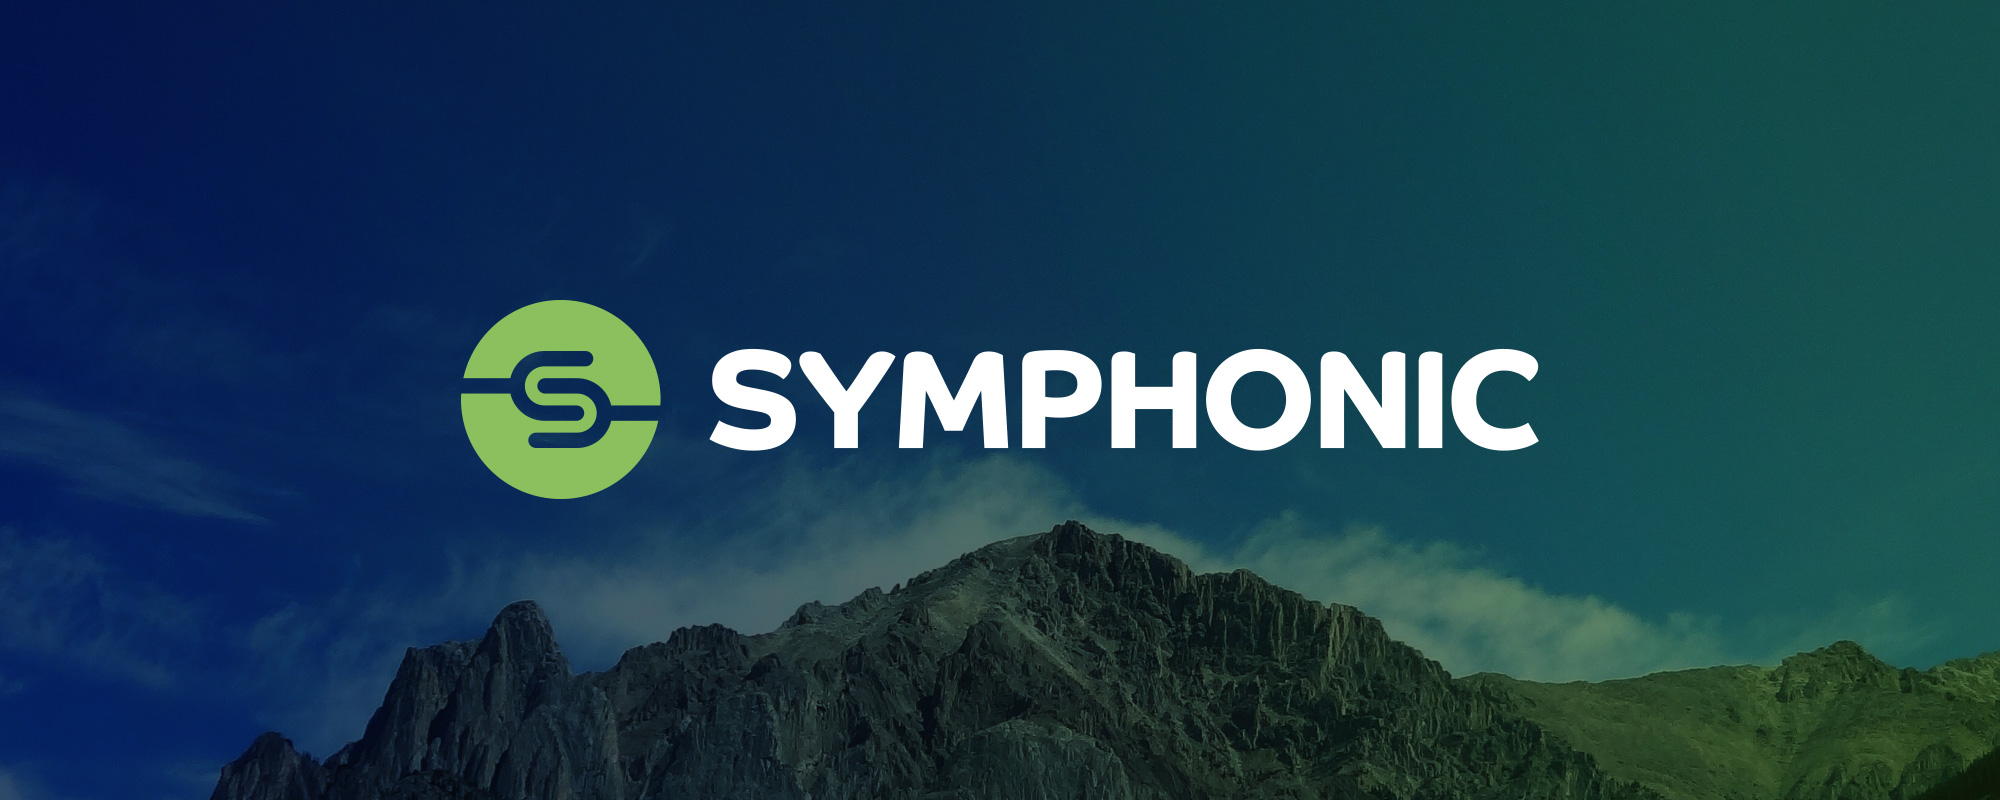 Symphonic-banner.jpg